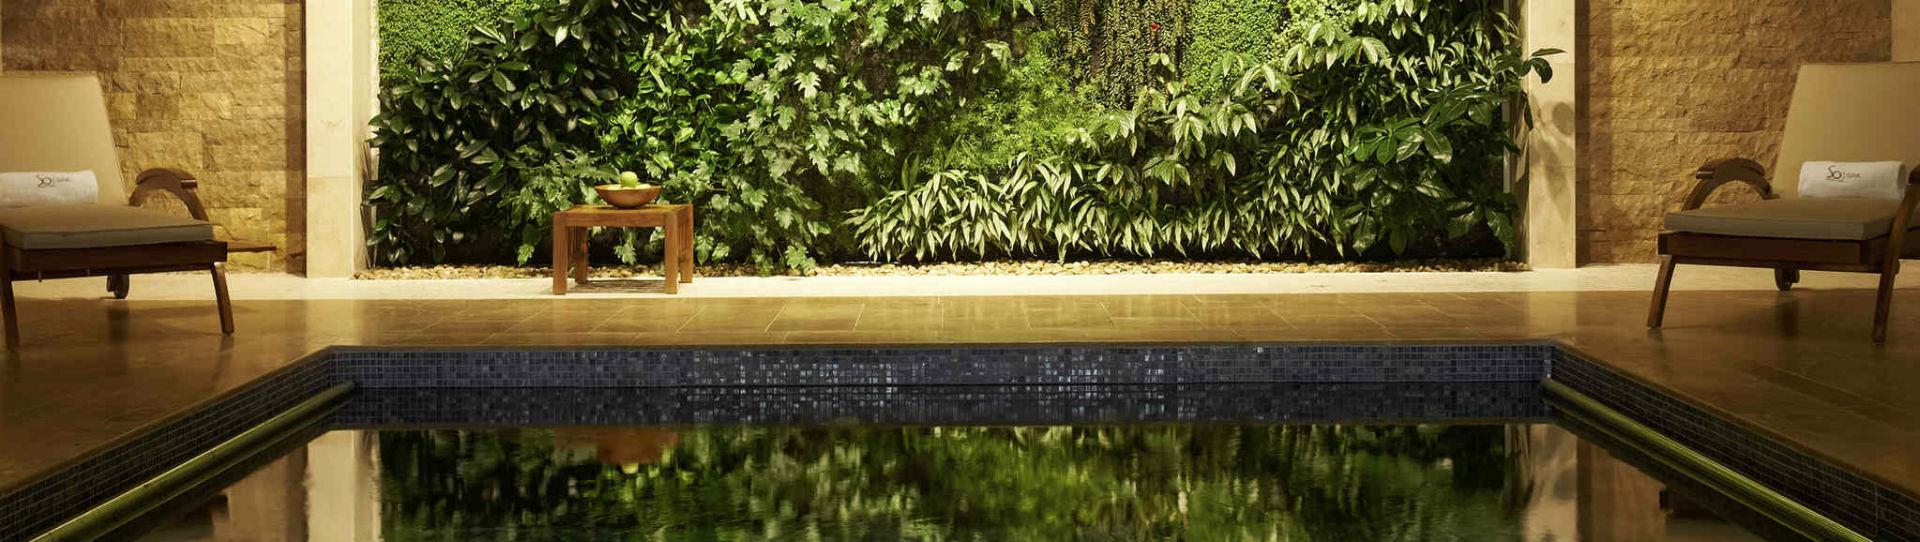 Sofitel The Palm, Dubai - spa pool